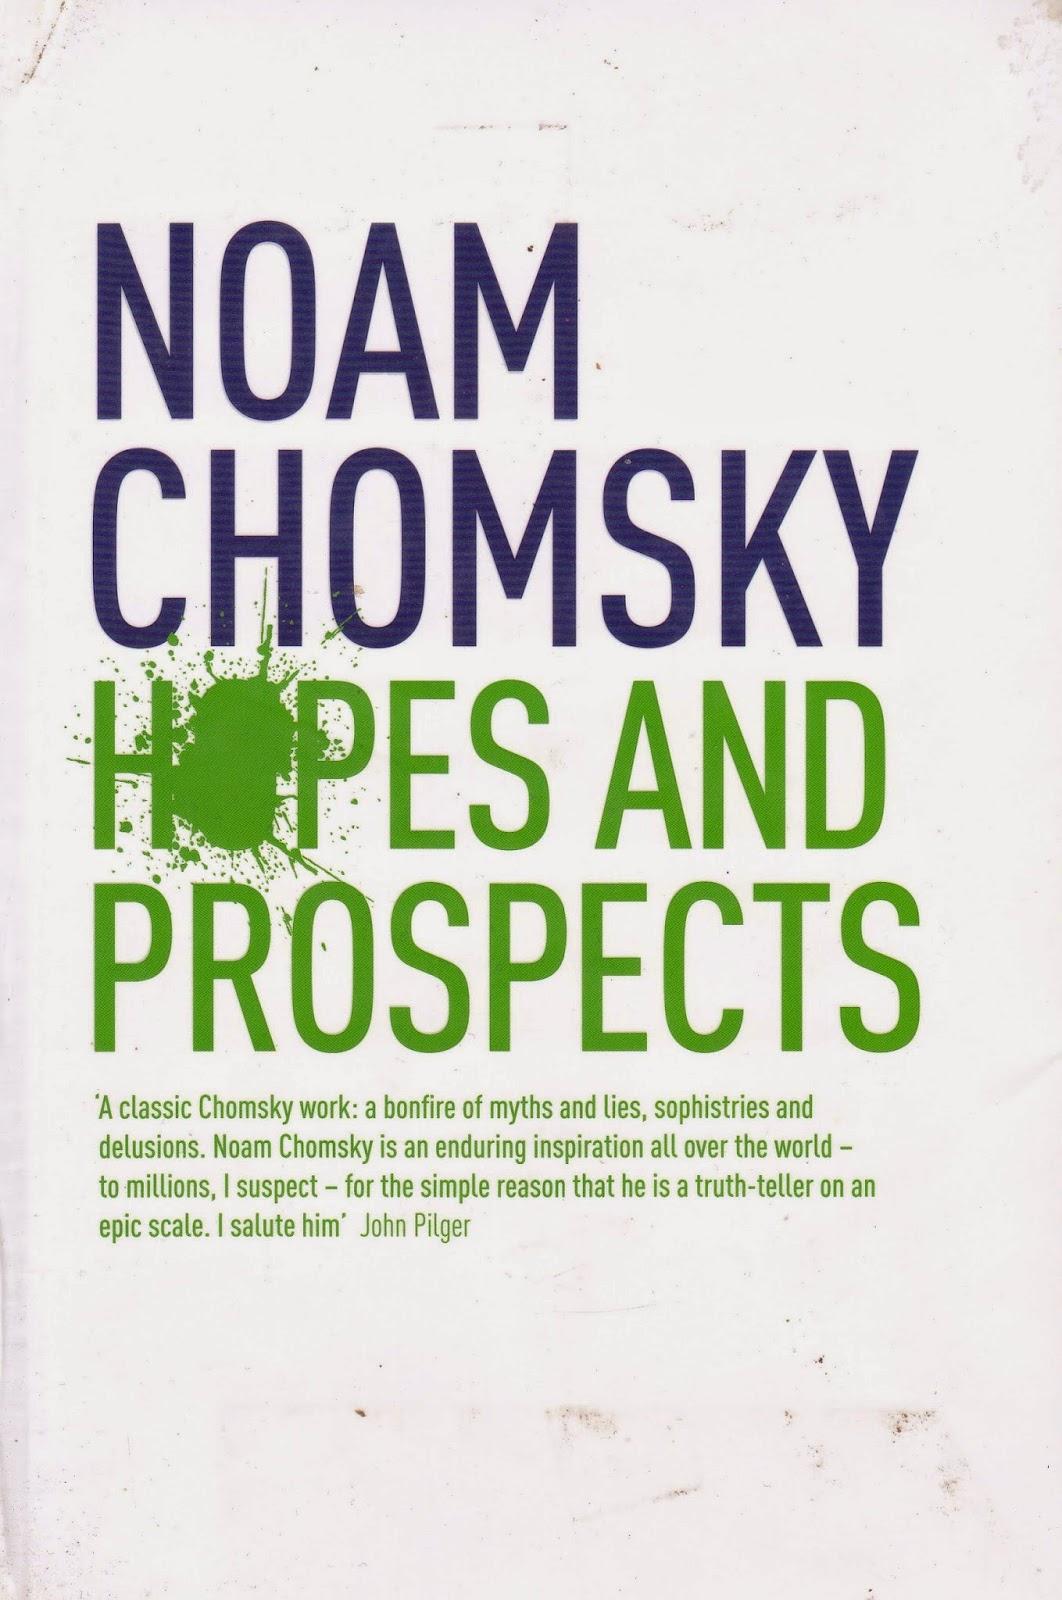 Noam chomsky two essays on cambodia